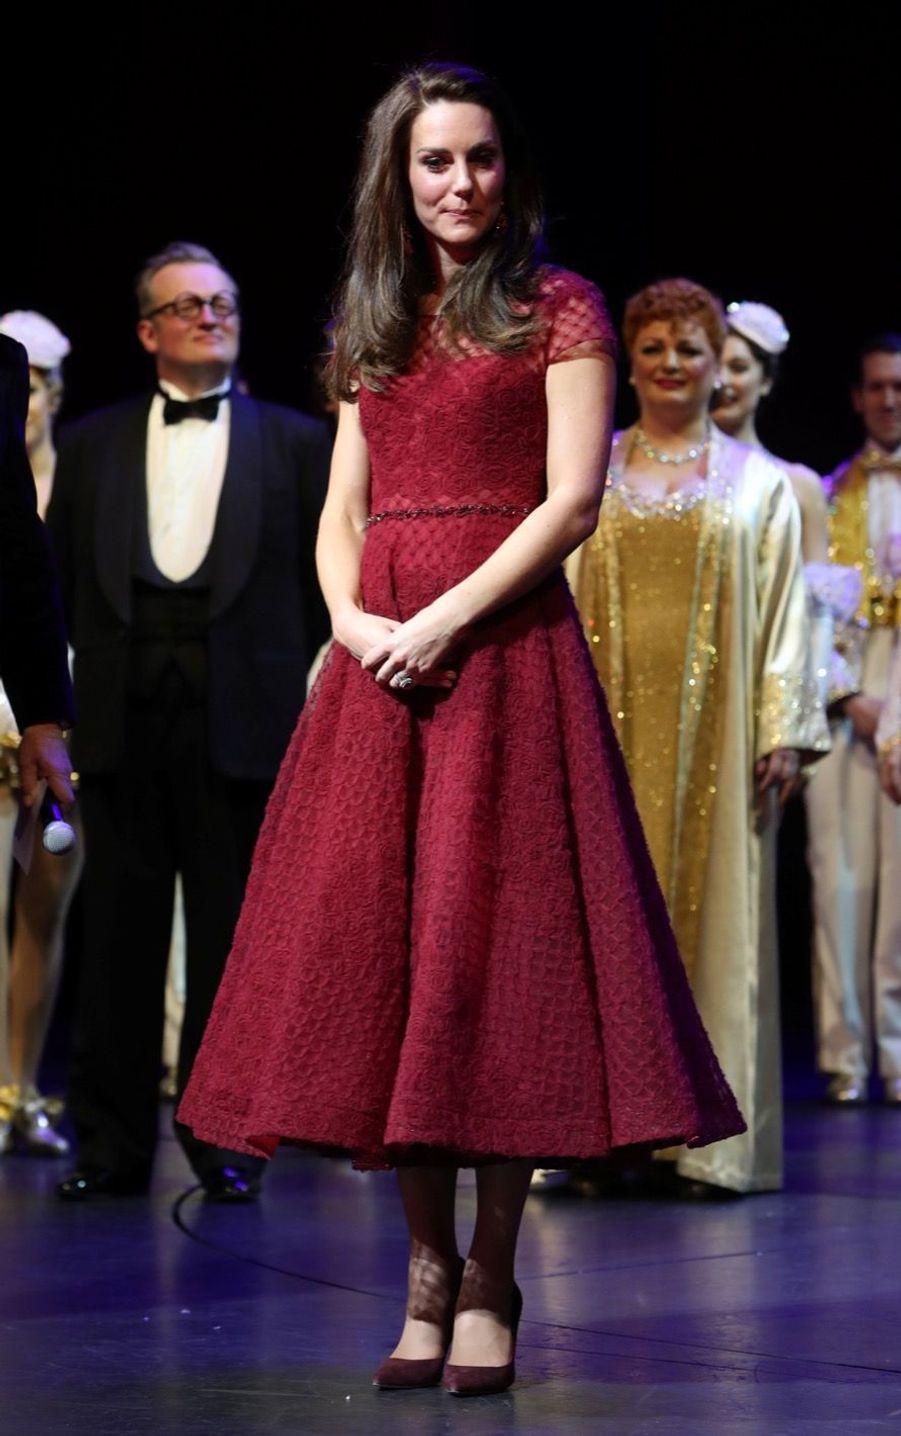 Kate Middleton Au Theatre Royal Drury Lane De Londres Mardi 4 Avril 2017 20